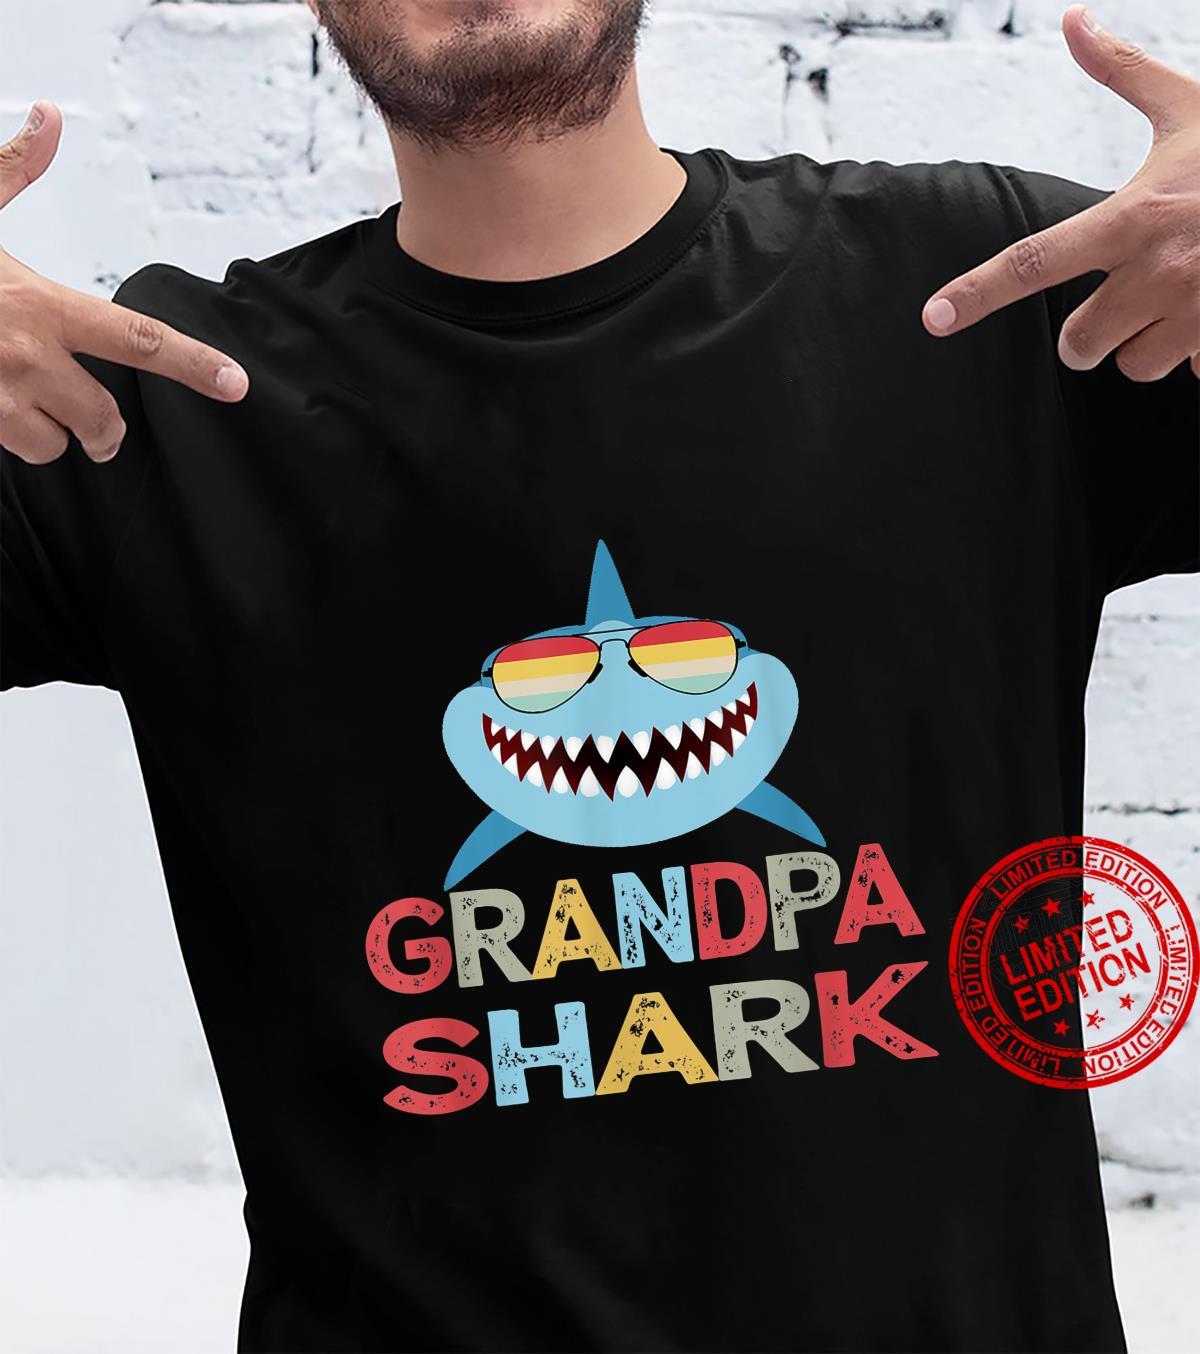 Grandpa Shark present for Granddad from Grandkids Shirt